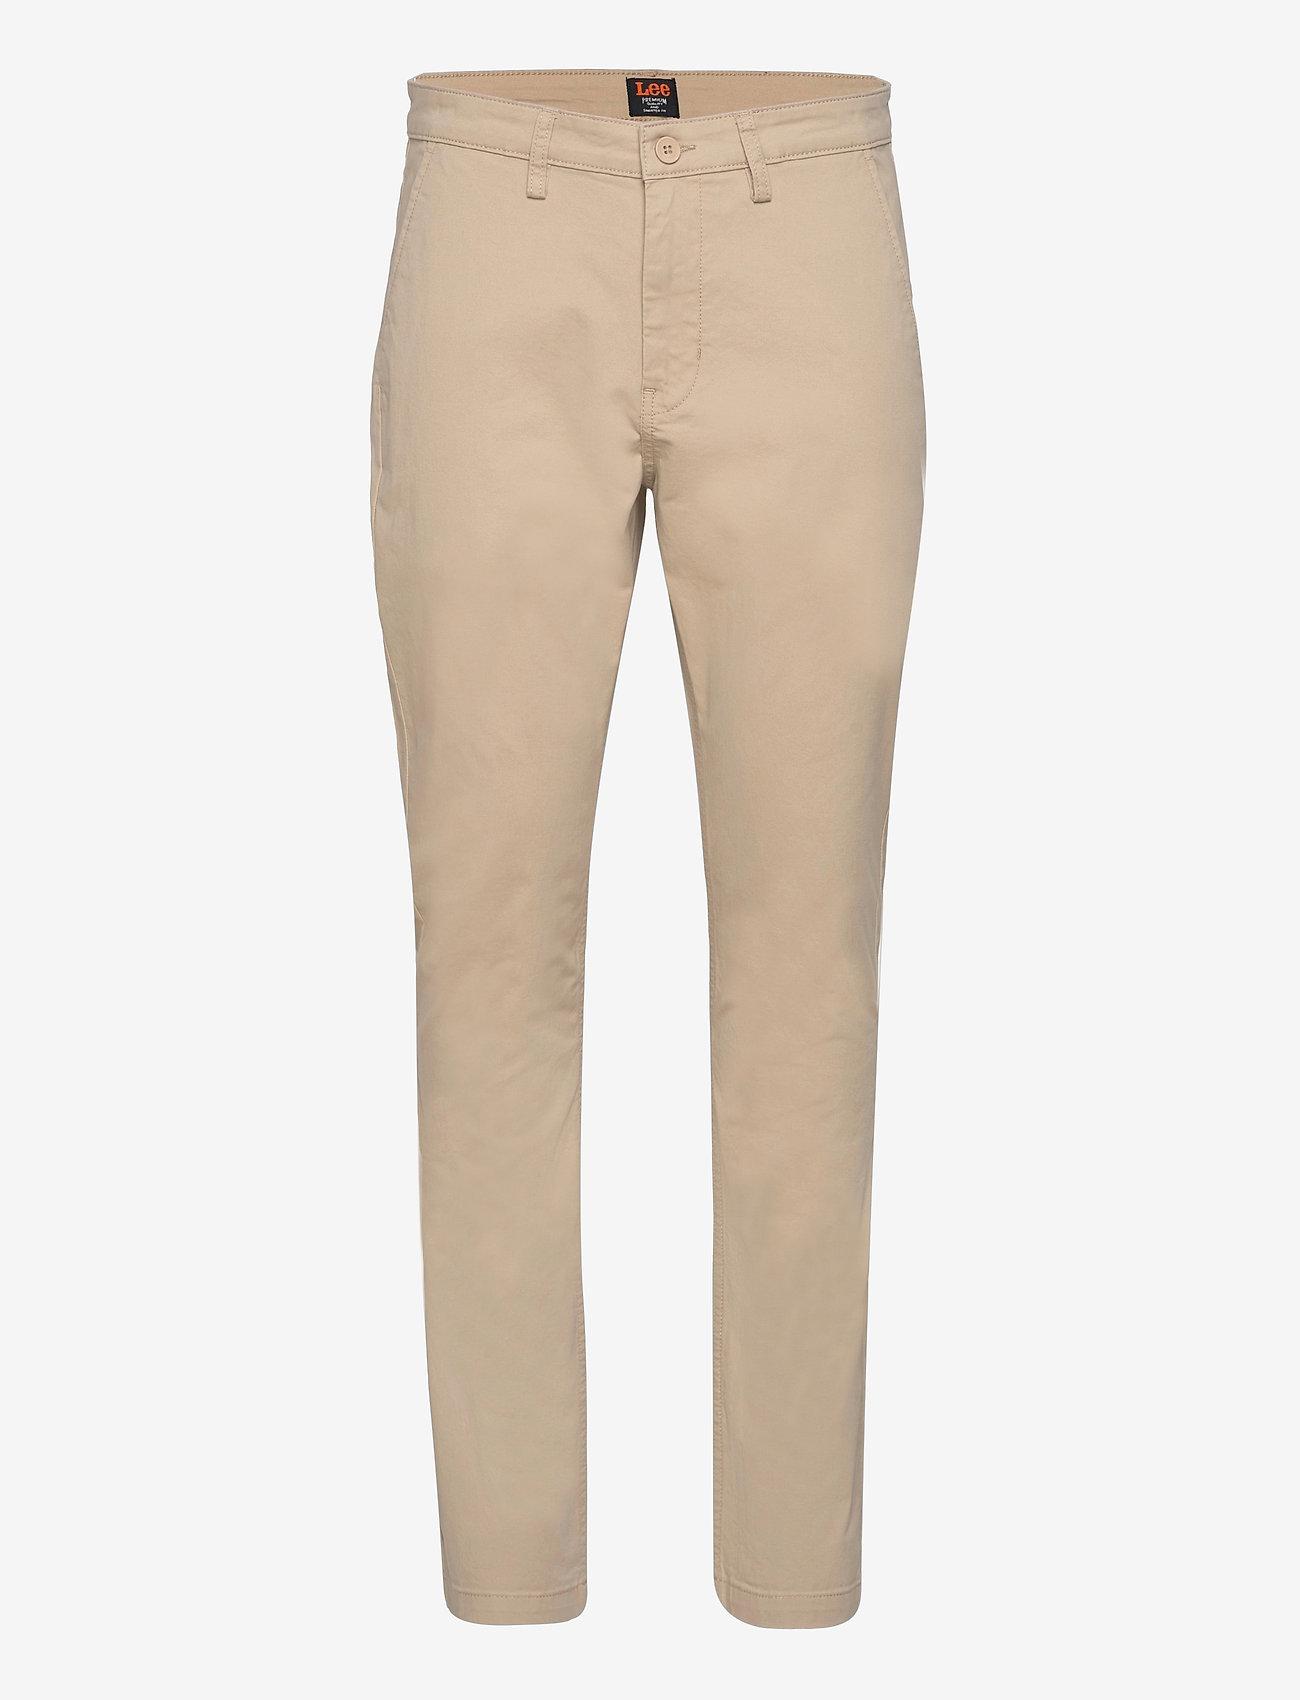 Lee Jeans - SLIM CHINO - chinos - service sand - 0